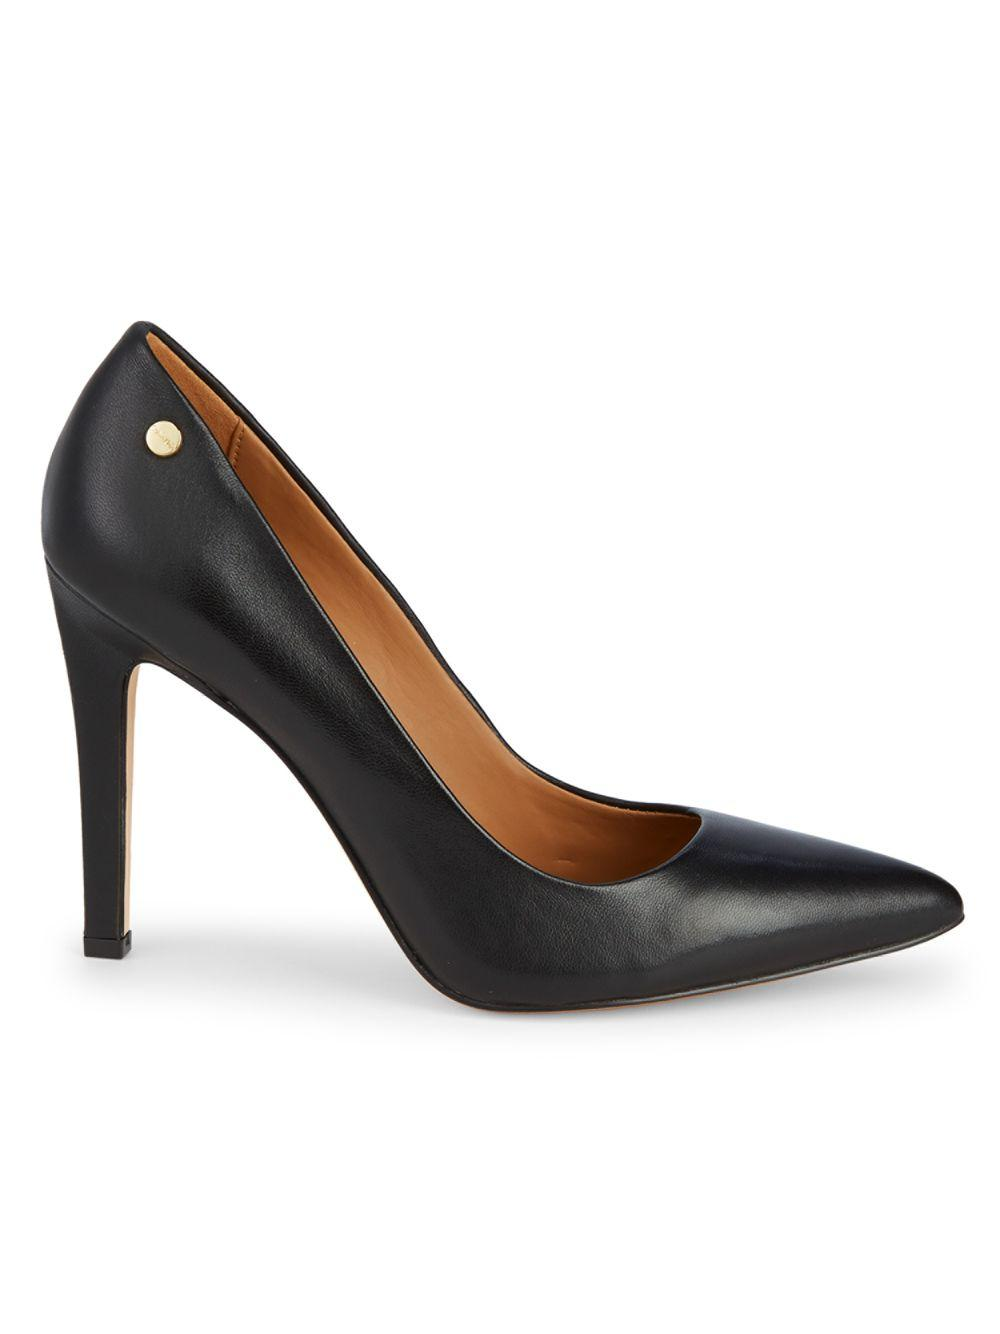 fd57bde2181 Lyst - Calvin Klein Brady Leather High Heel Pumps in Black